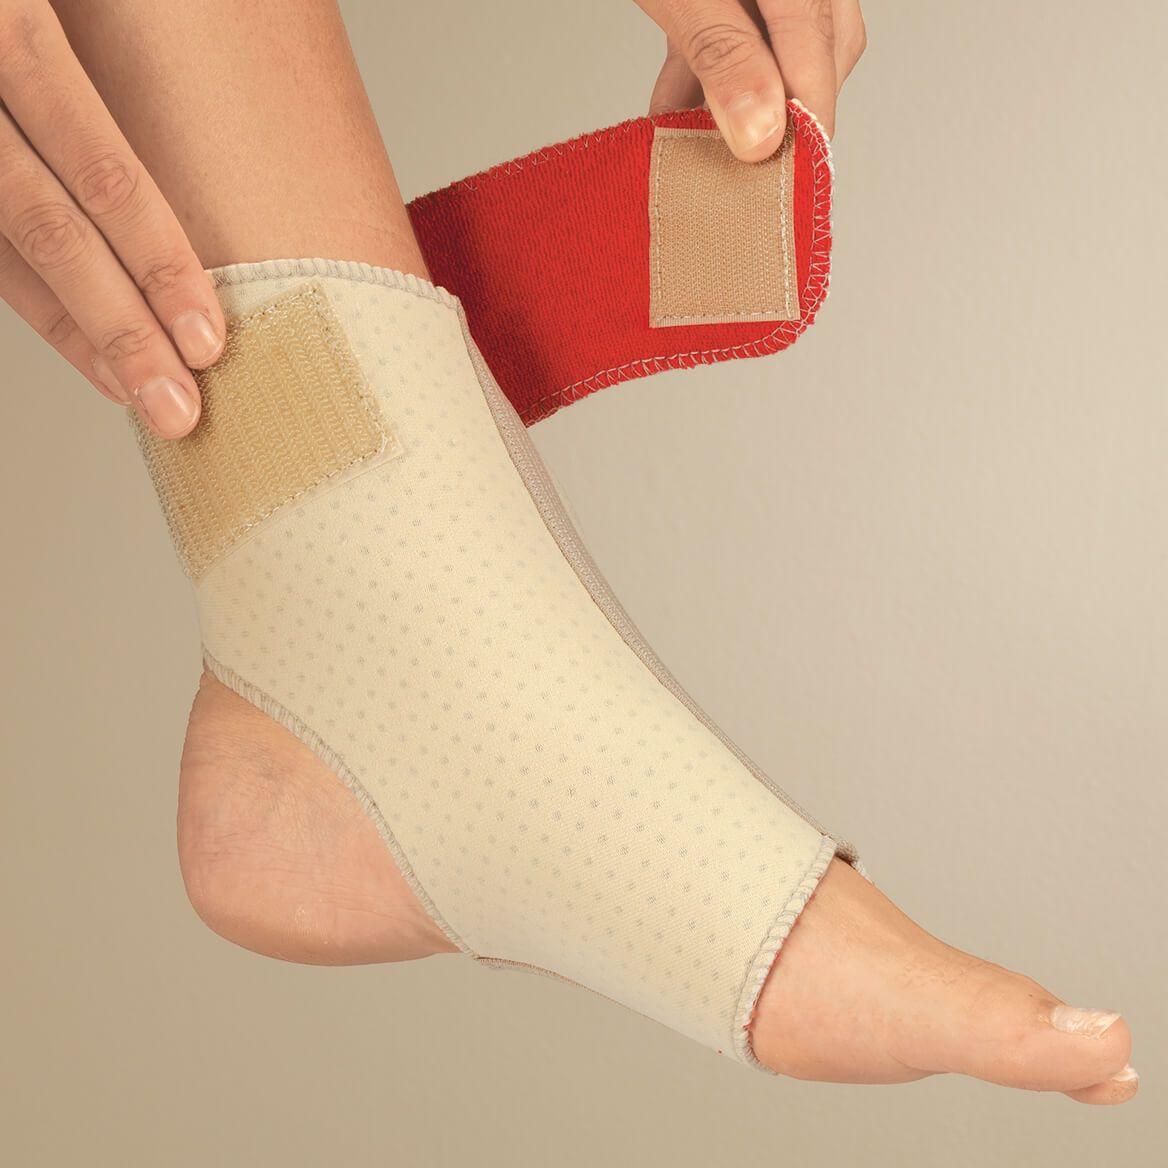 Arthritic Neoprene Ankle Support-361272